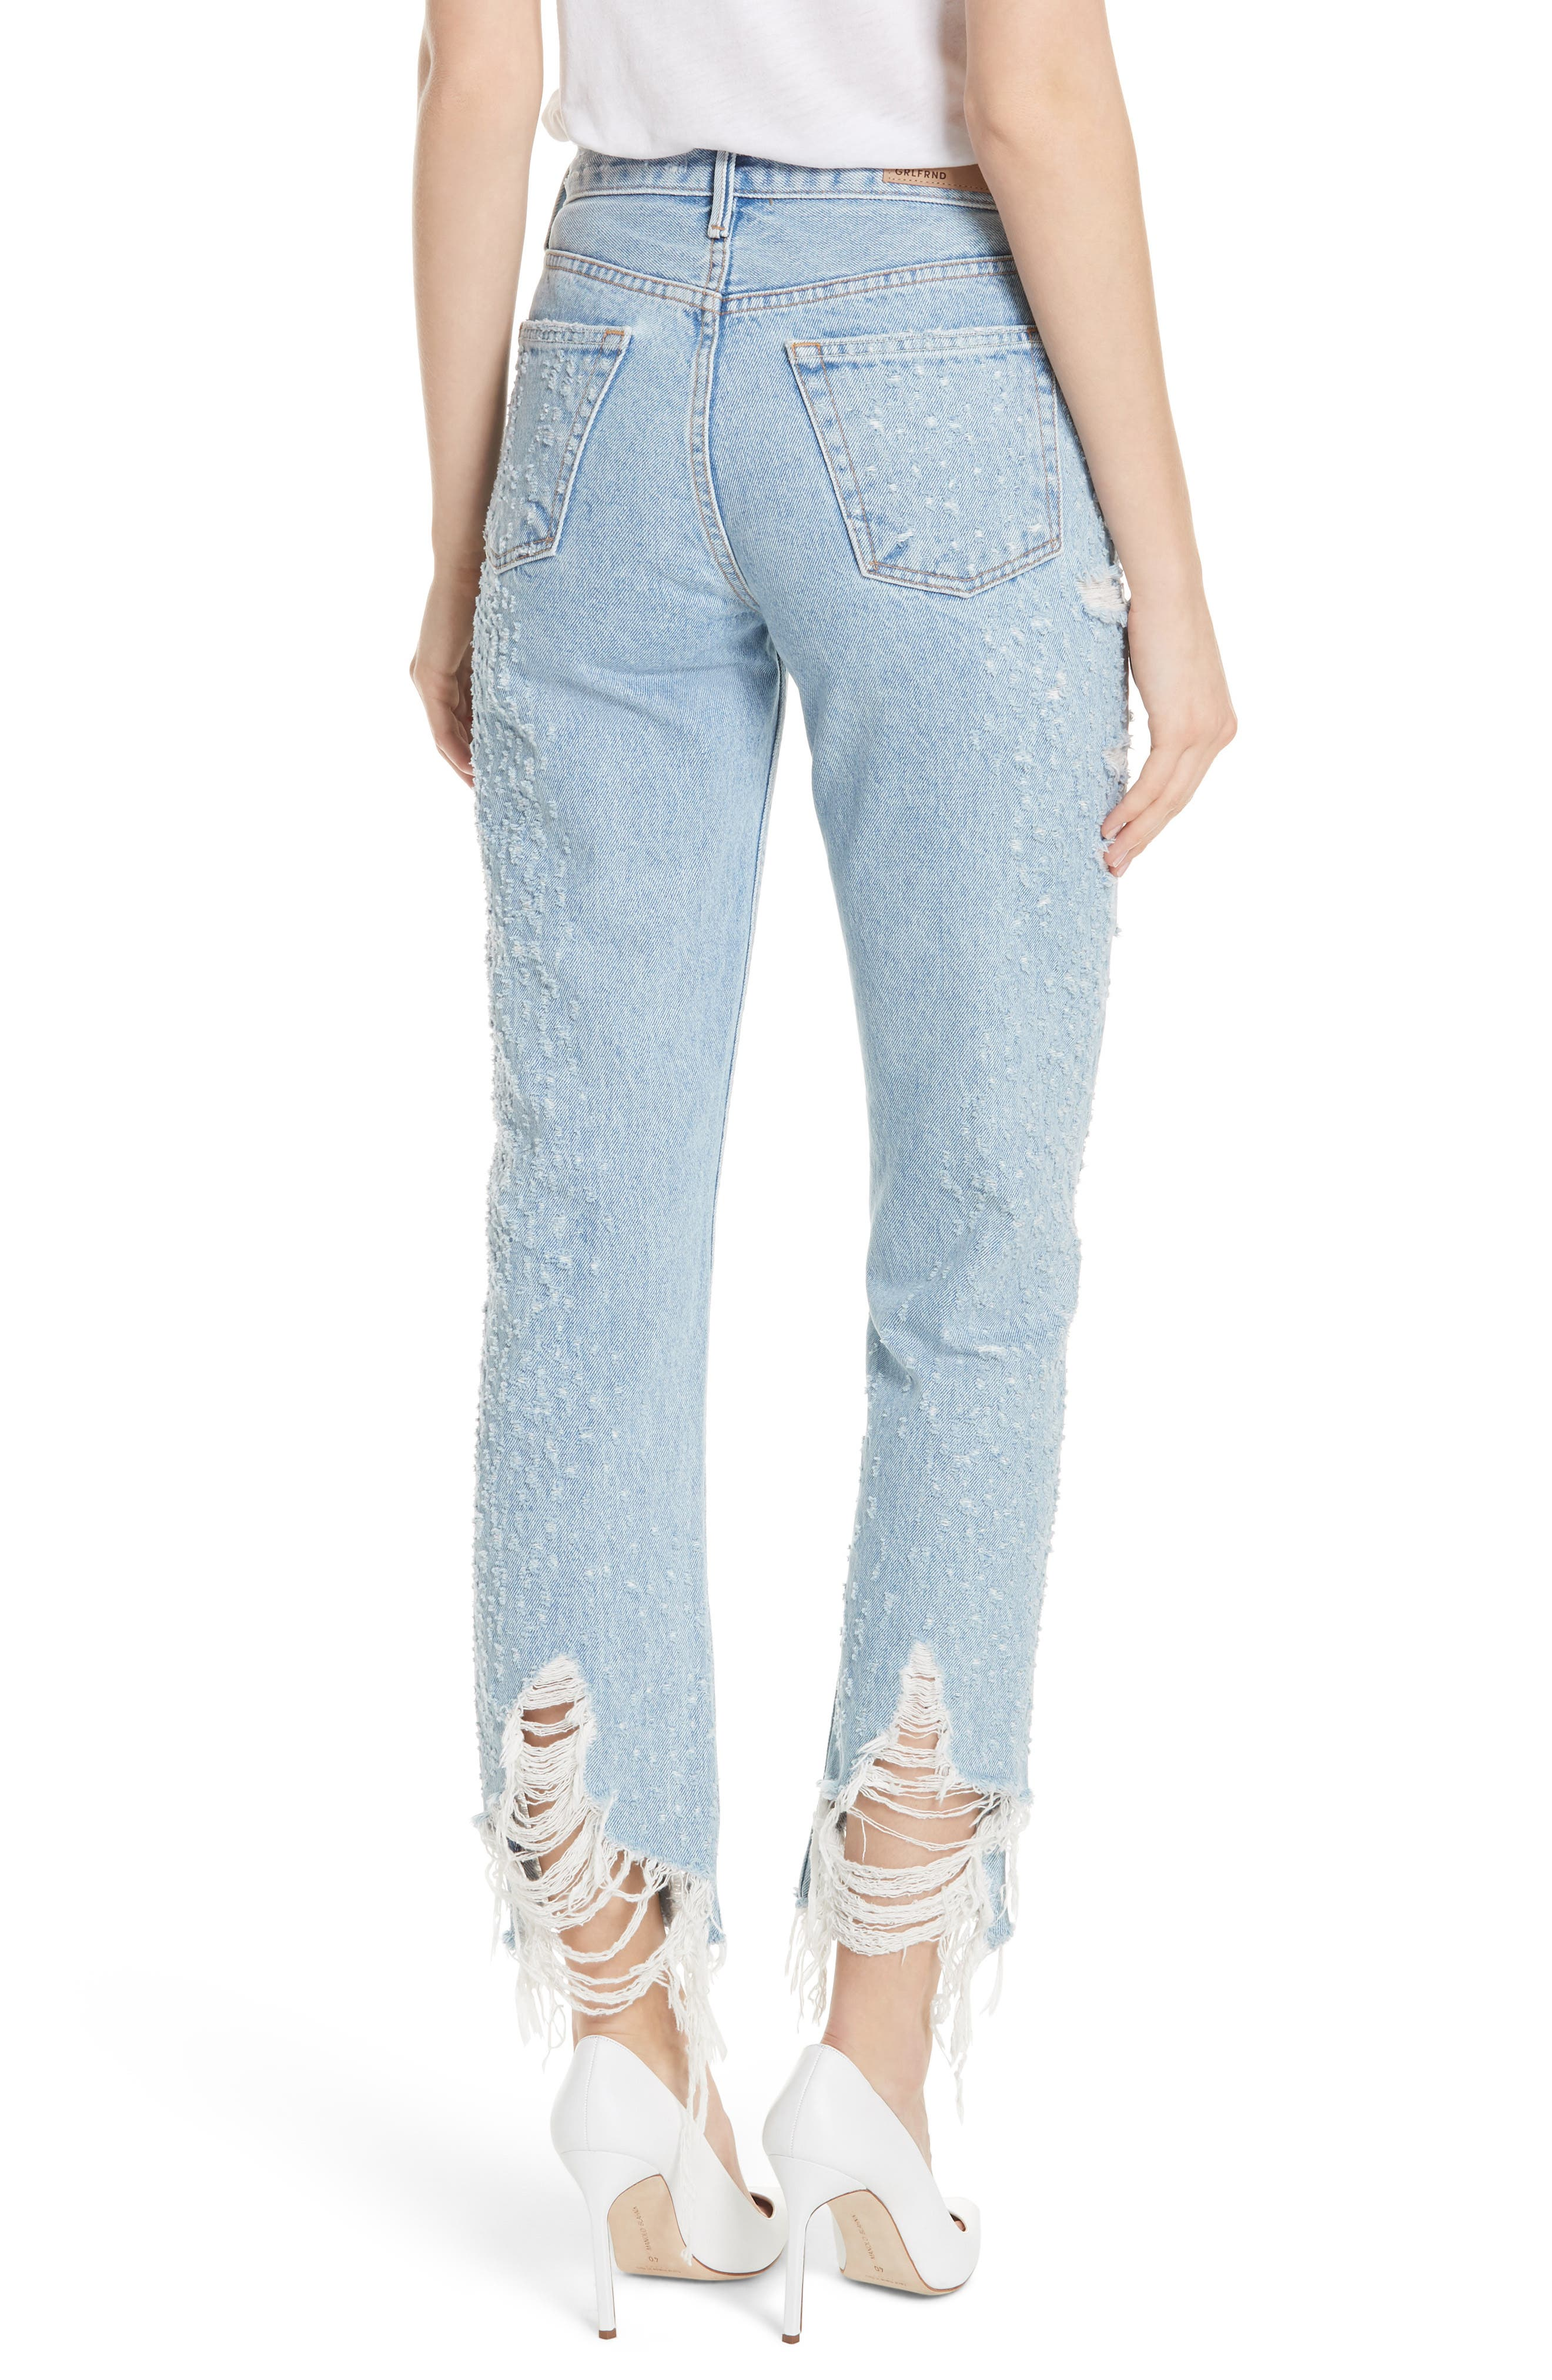 Helena Rigid High Waist Straight Jeans,                             Alternate thumbnail 2, color,                             BURN OUT